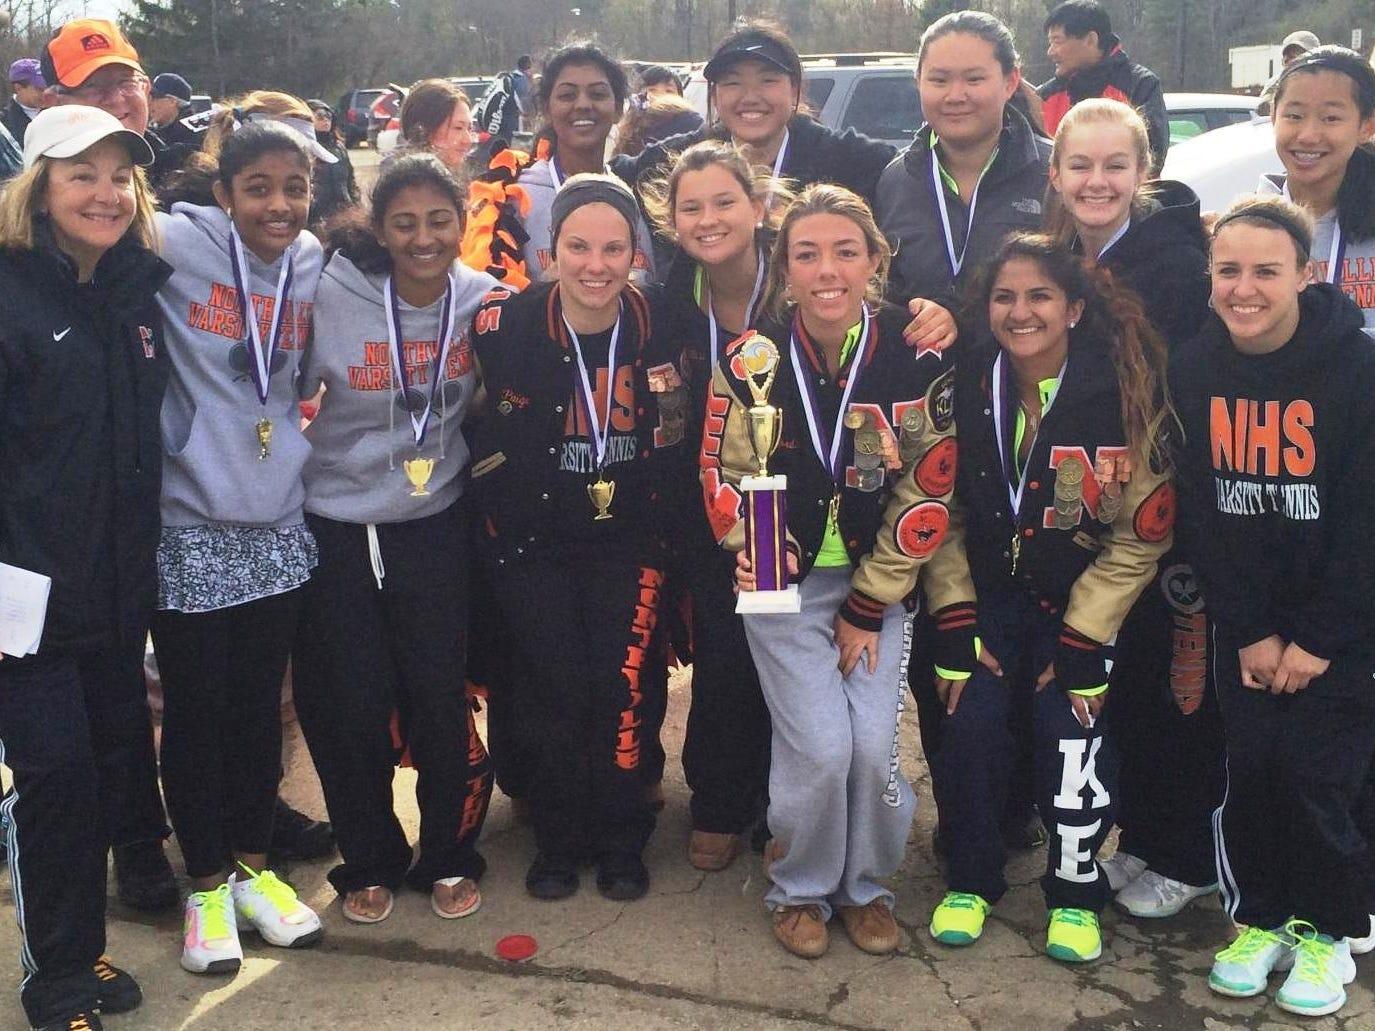 The top-ranked Northville girls tennis team won the Ann Arbor Pioneer Quad on Saturday.